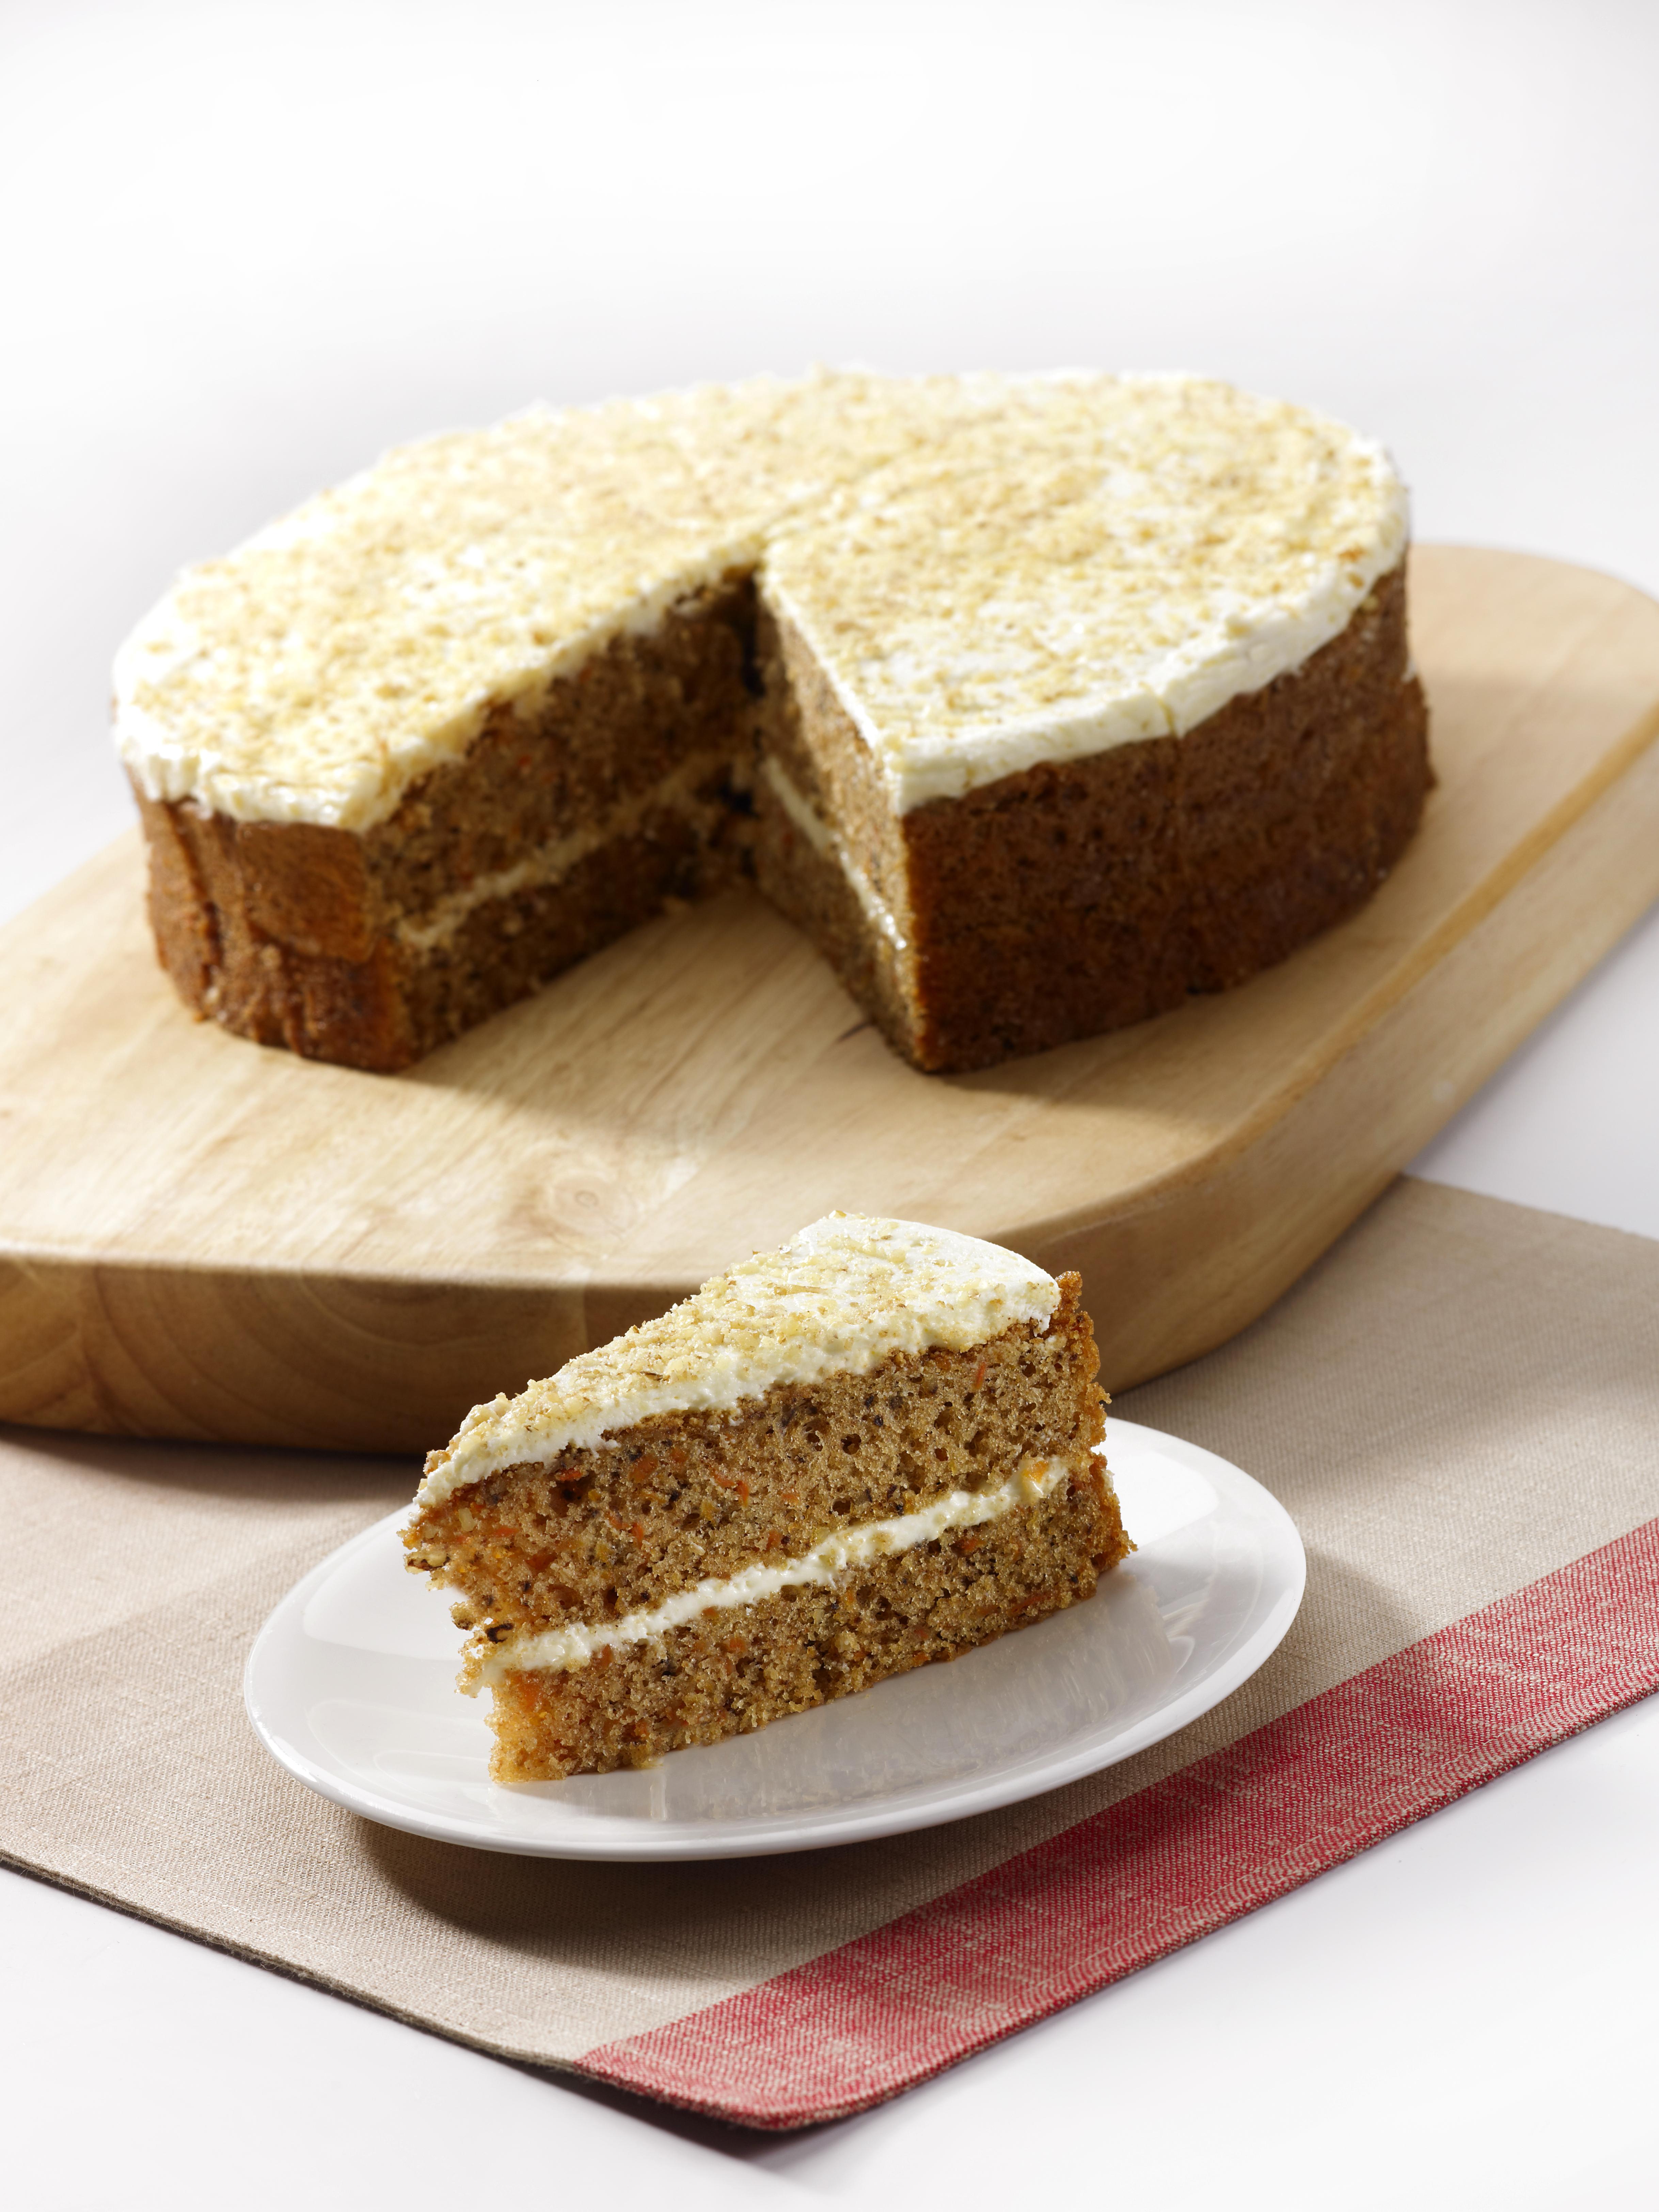 HCC072501 Round Carrot Cake